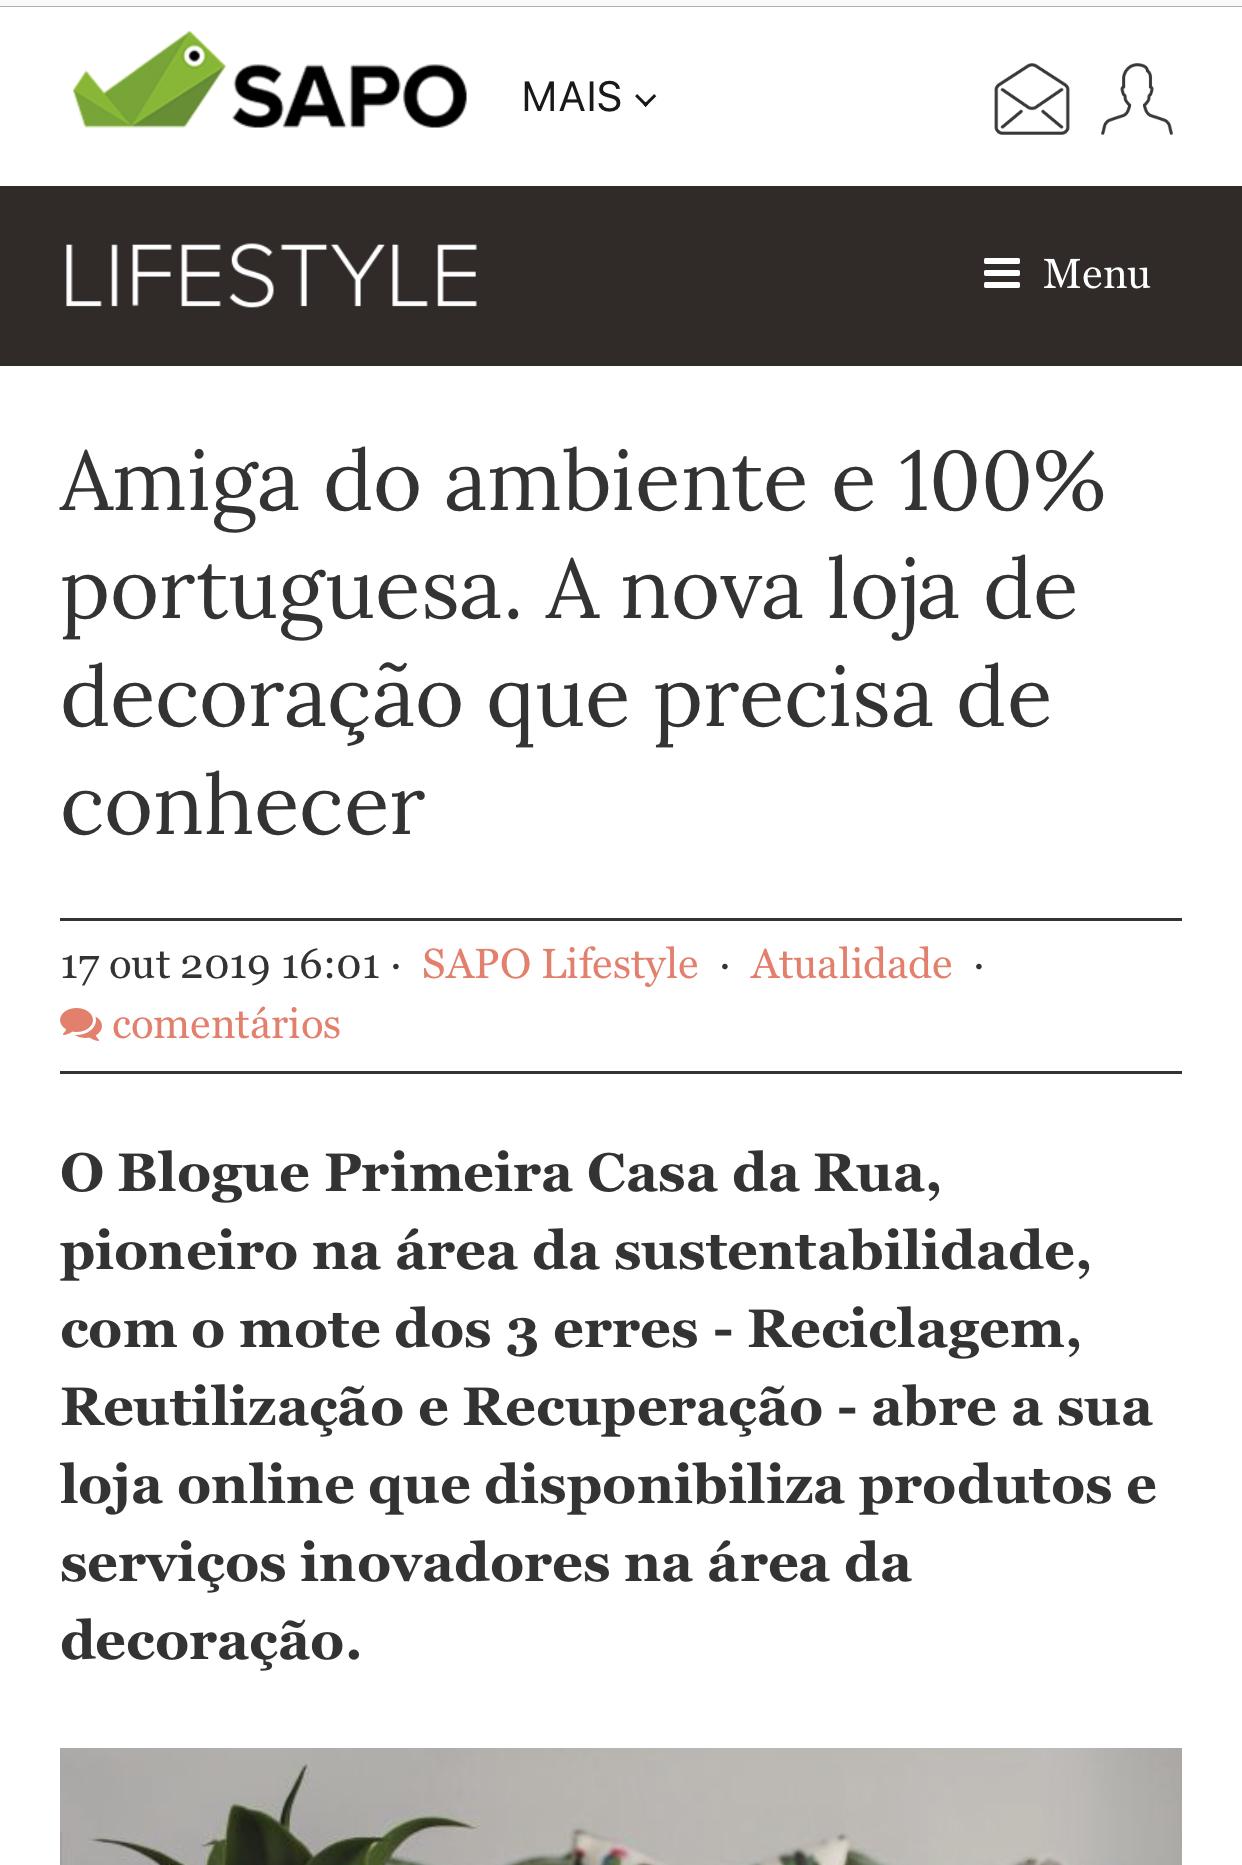 Nuno Matos Cabral @ Sapo Lifestyle